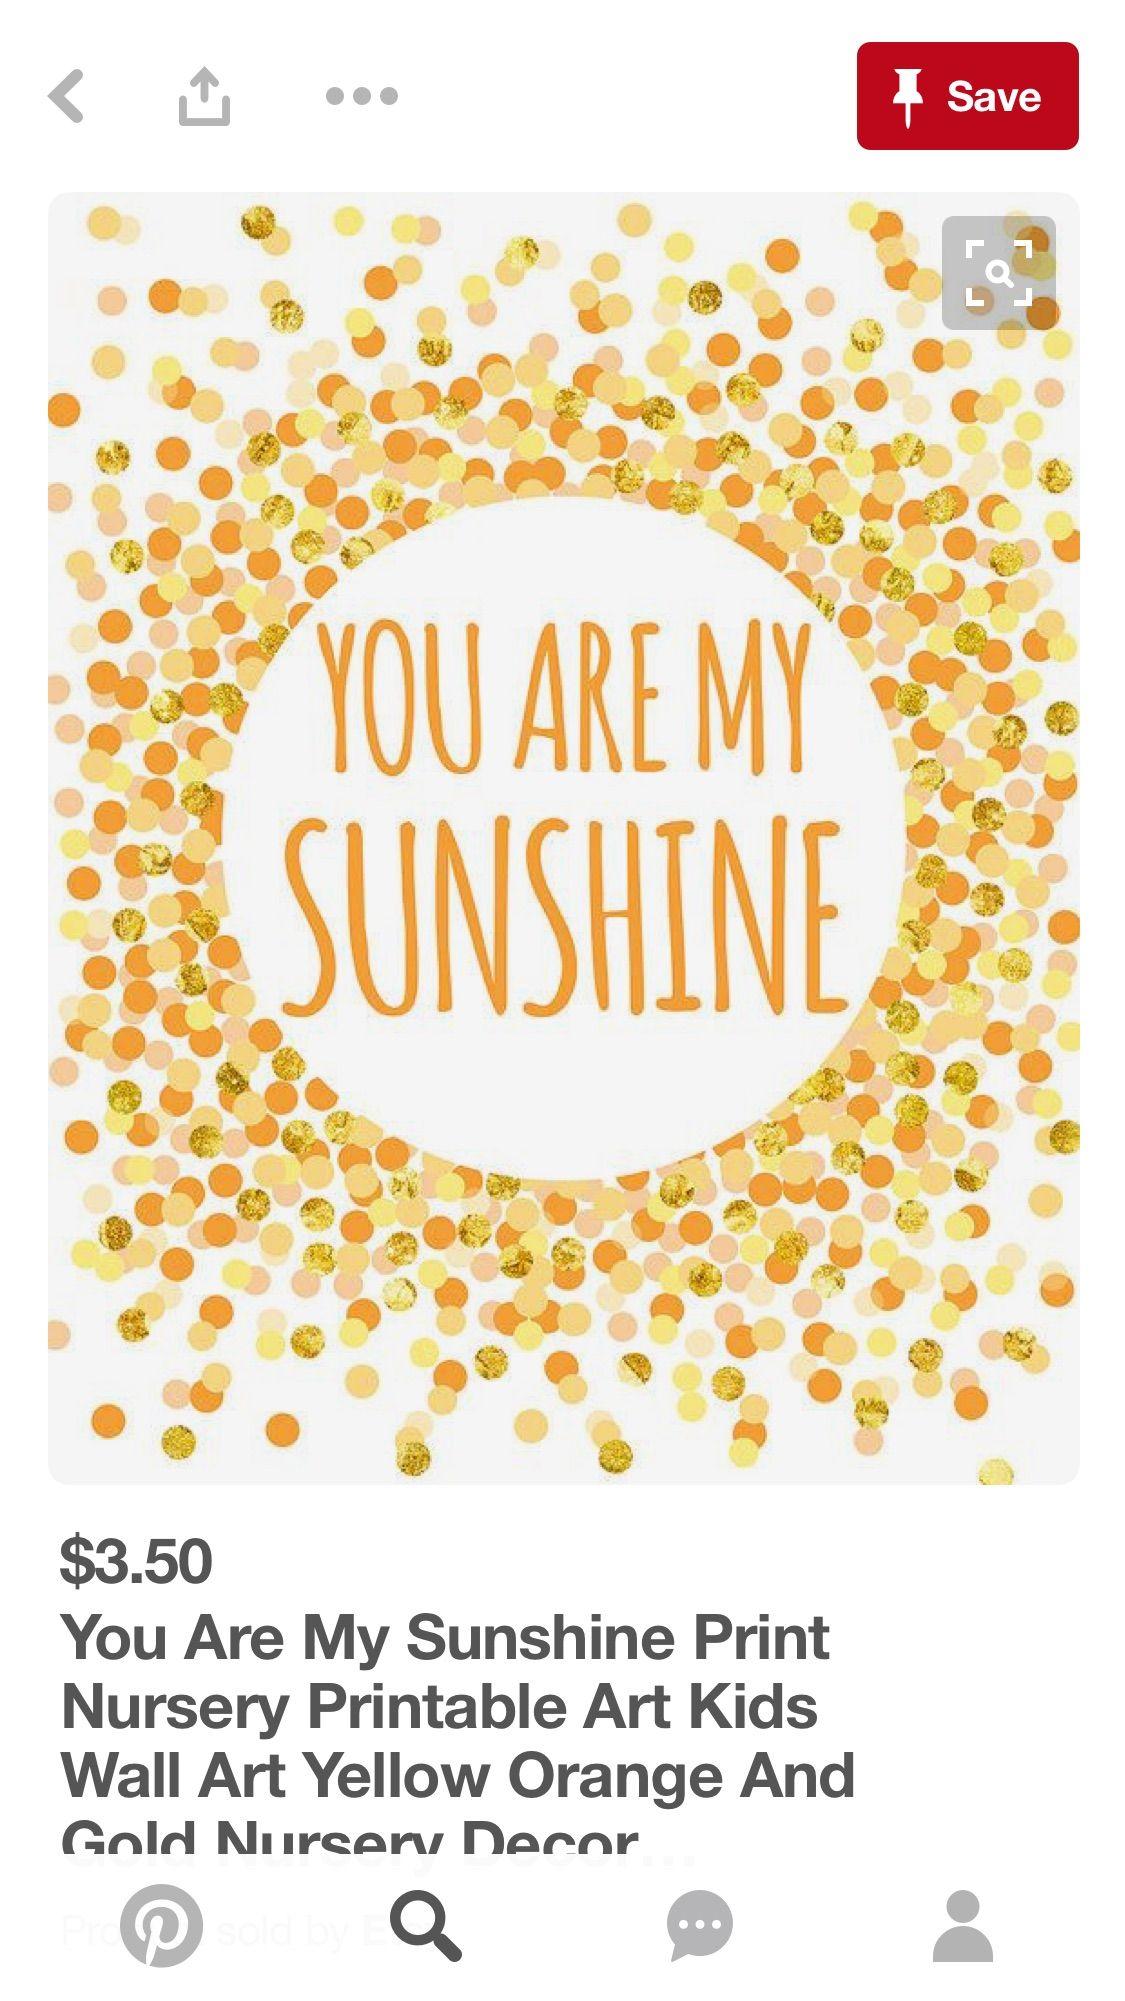 Pin by Laura Machicek on Sunshine | Pinterest | Sunshine